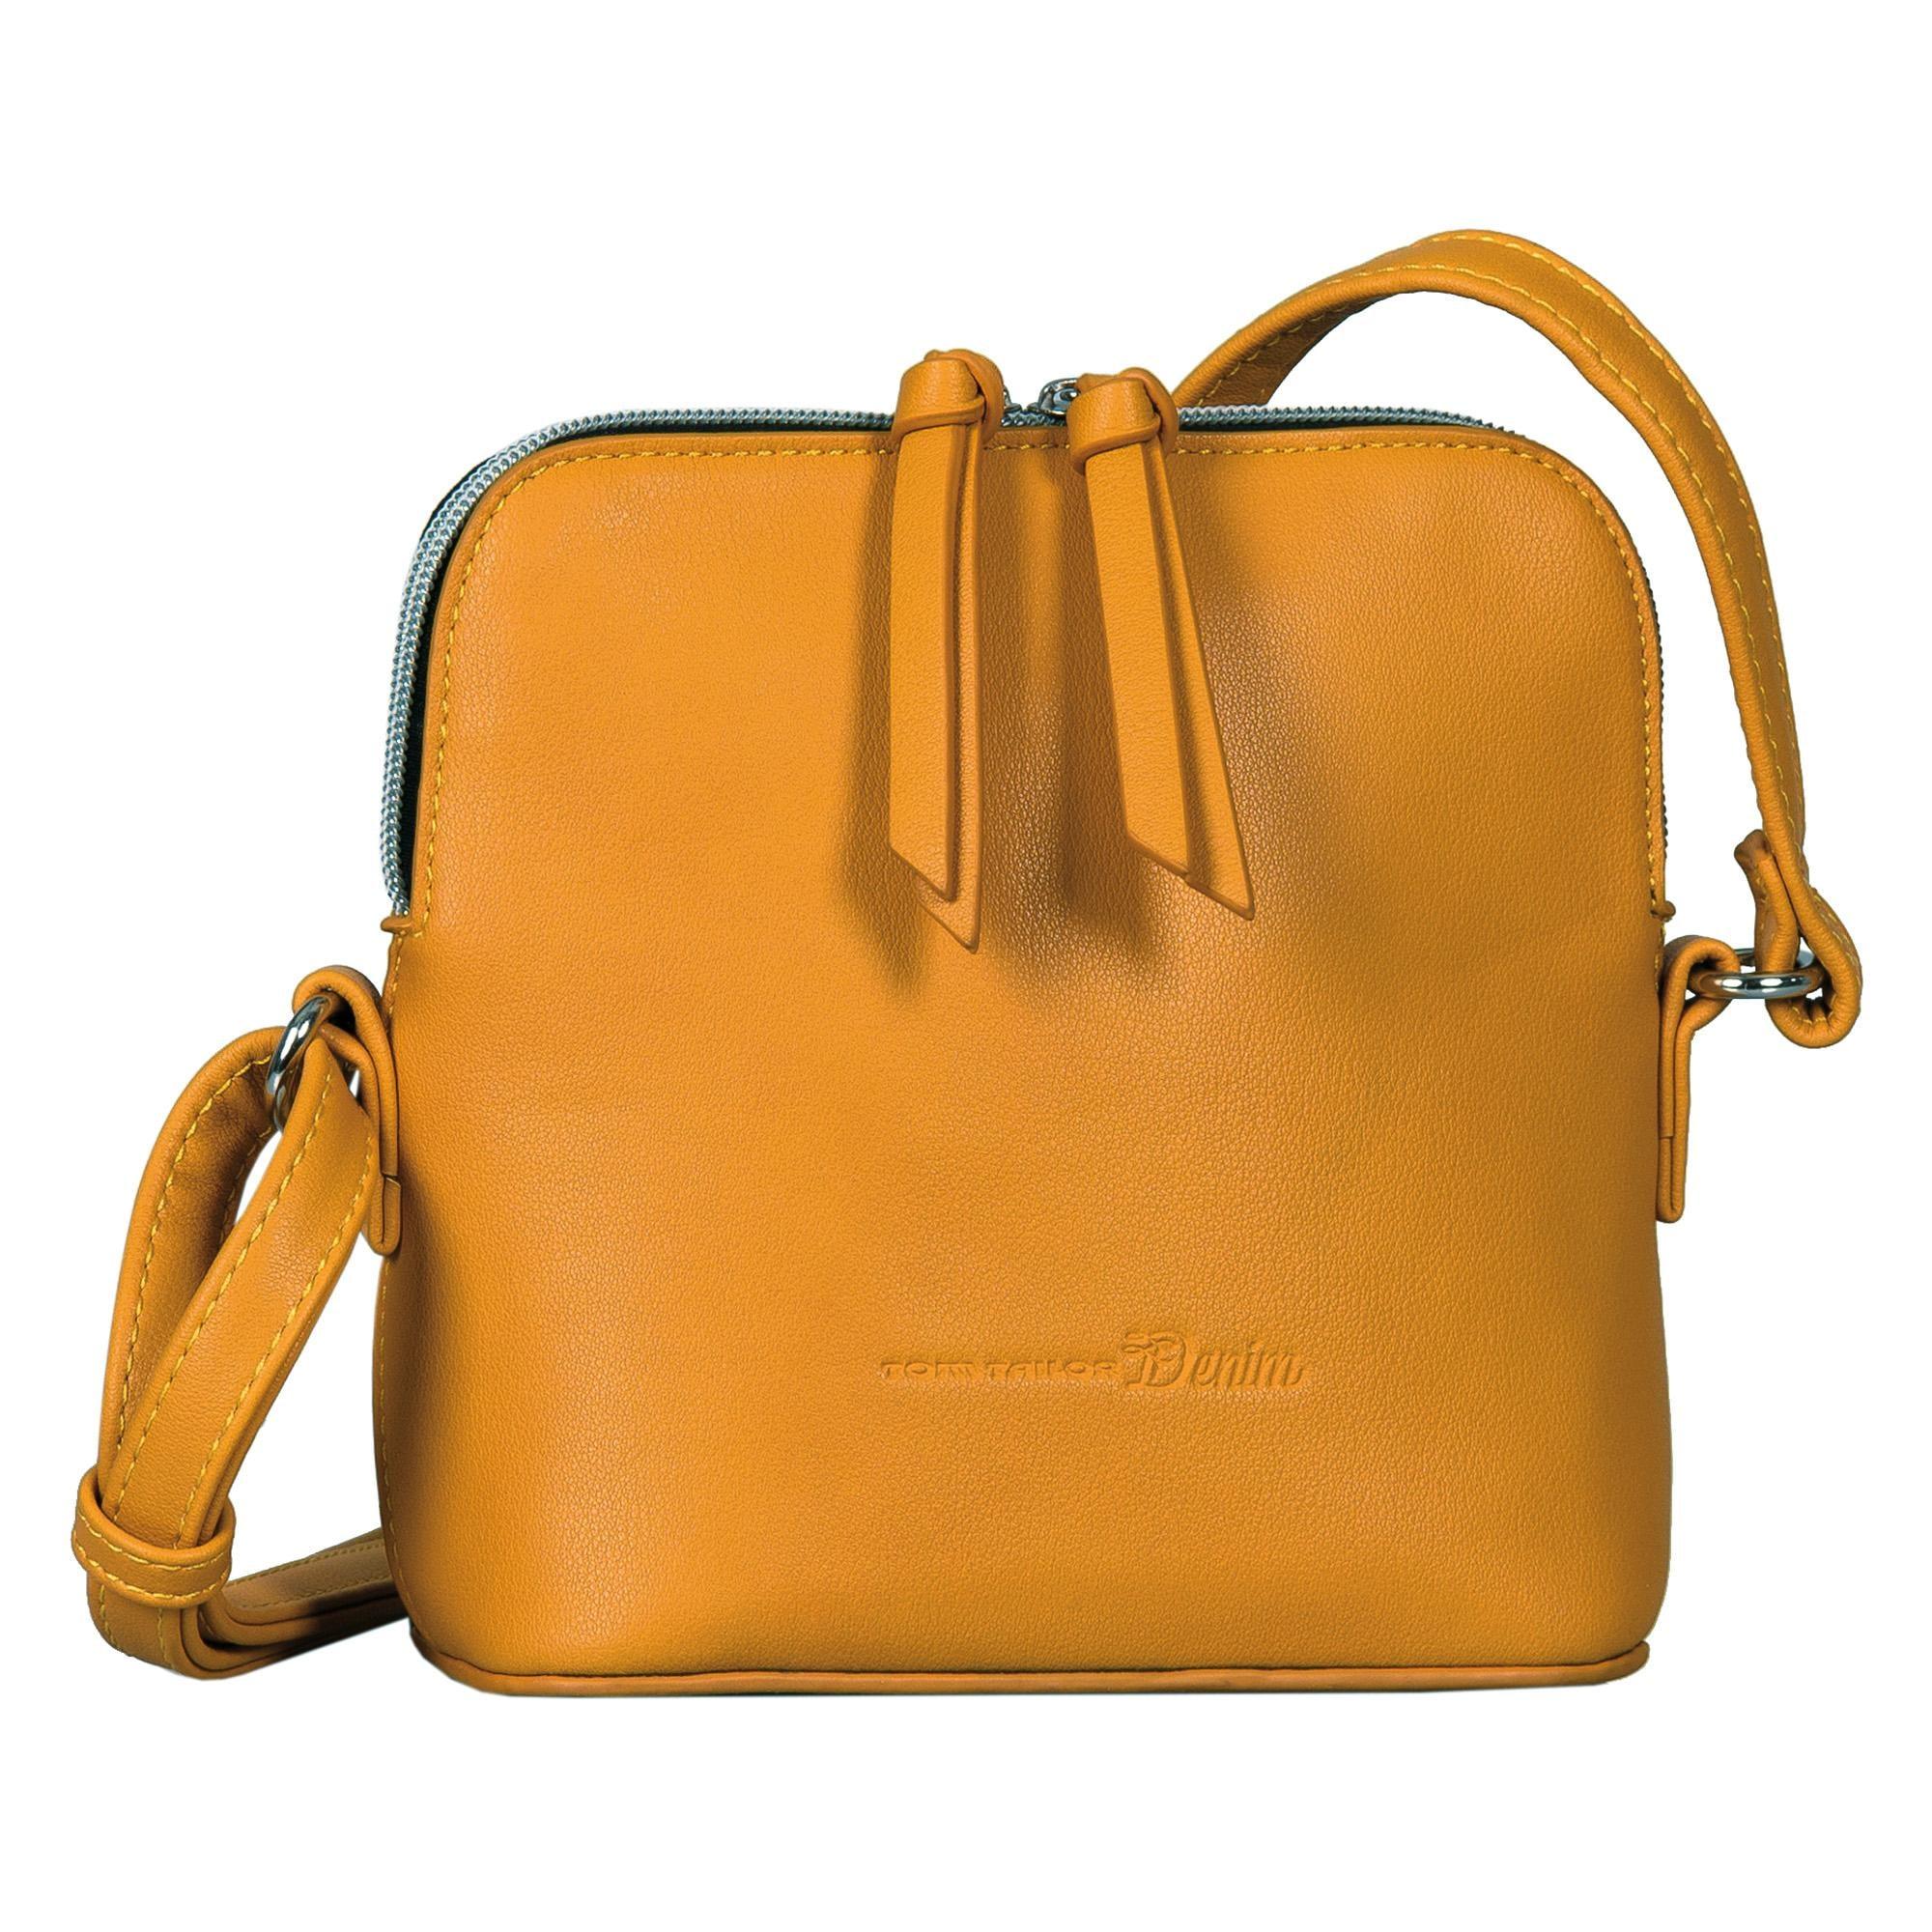 TOM TAILOR Denim Mini Bag Freia | Taschen > Handtaschen > Abendtaschen | Gelb | Tom Tailor Denim